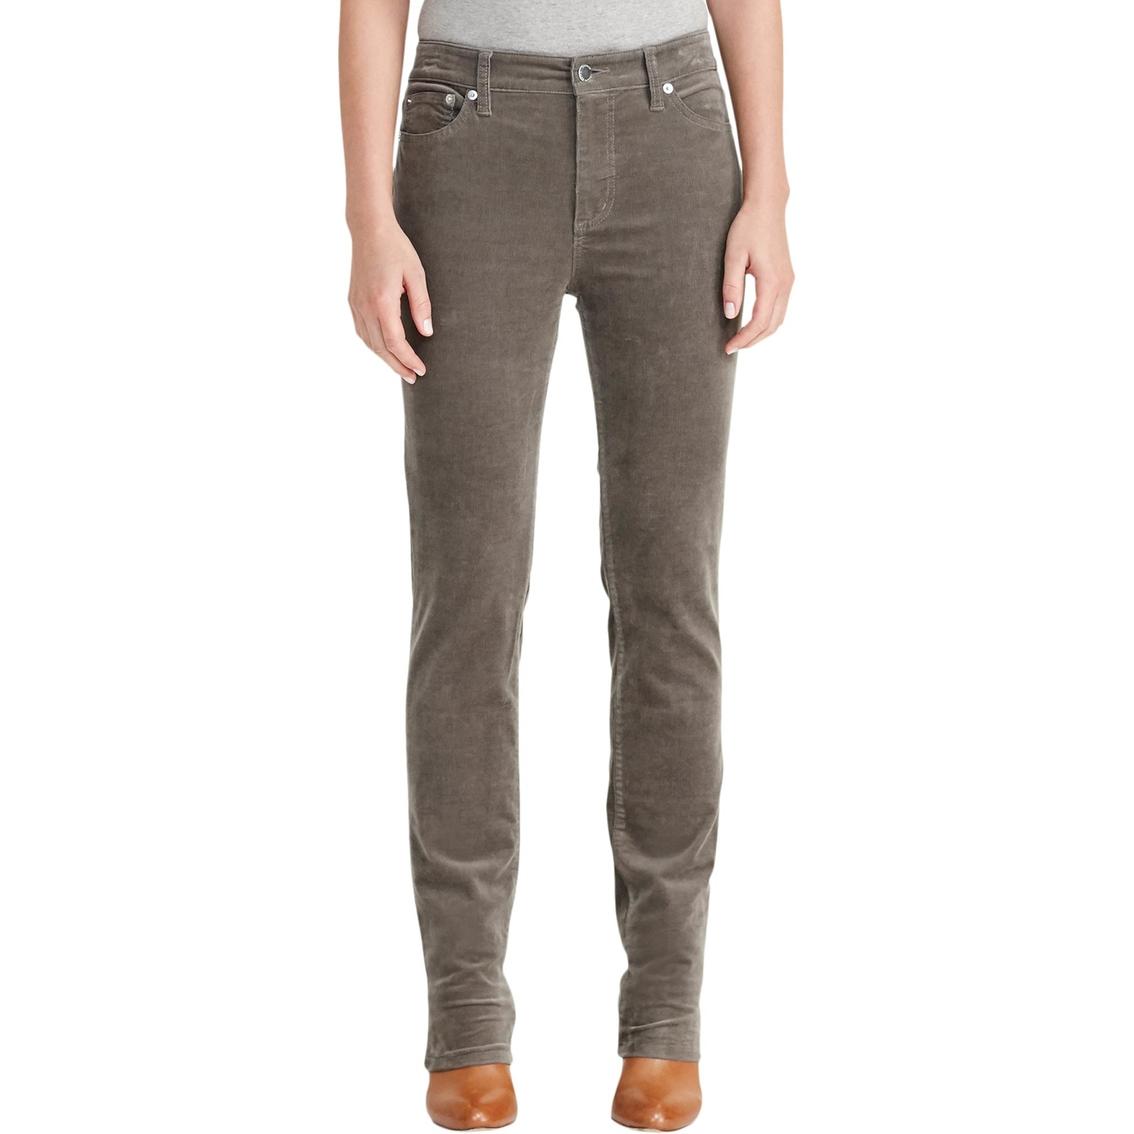 Brown corduroy pants